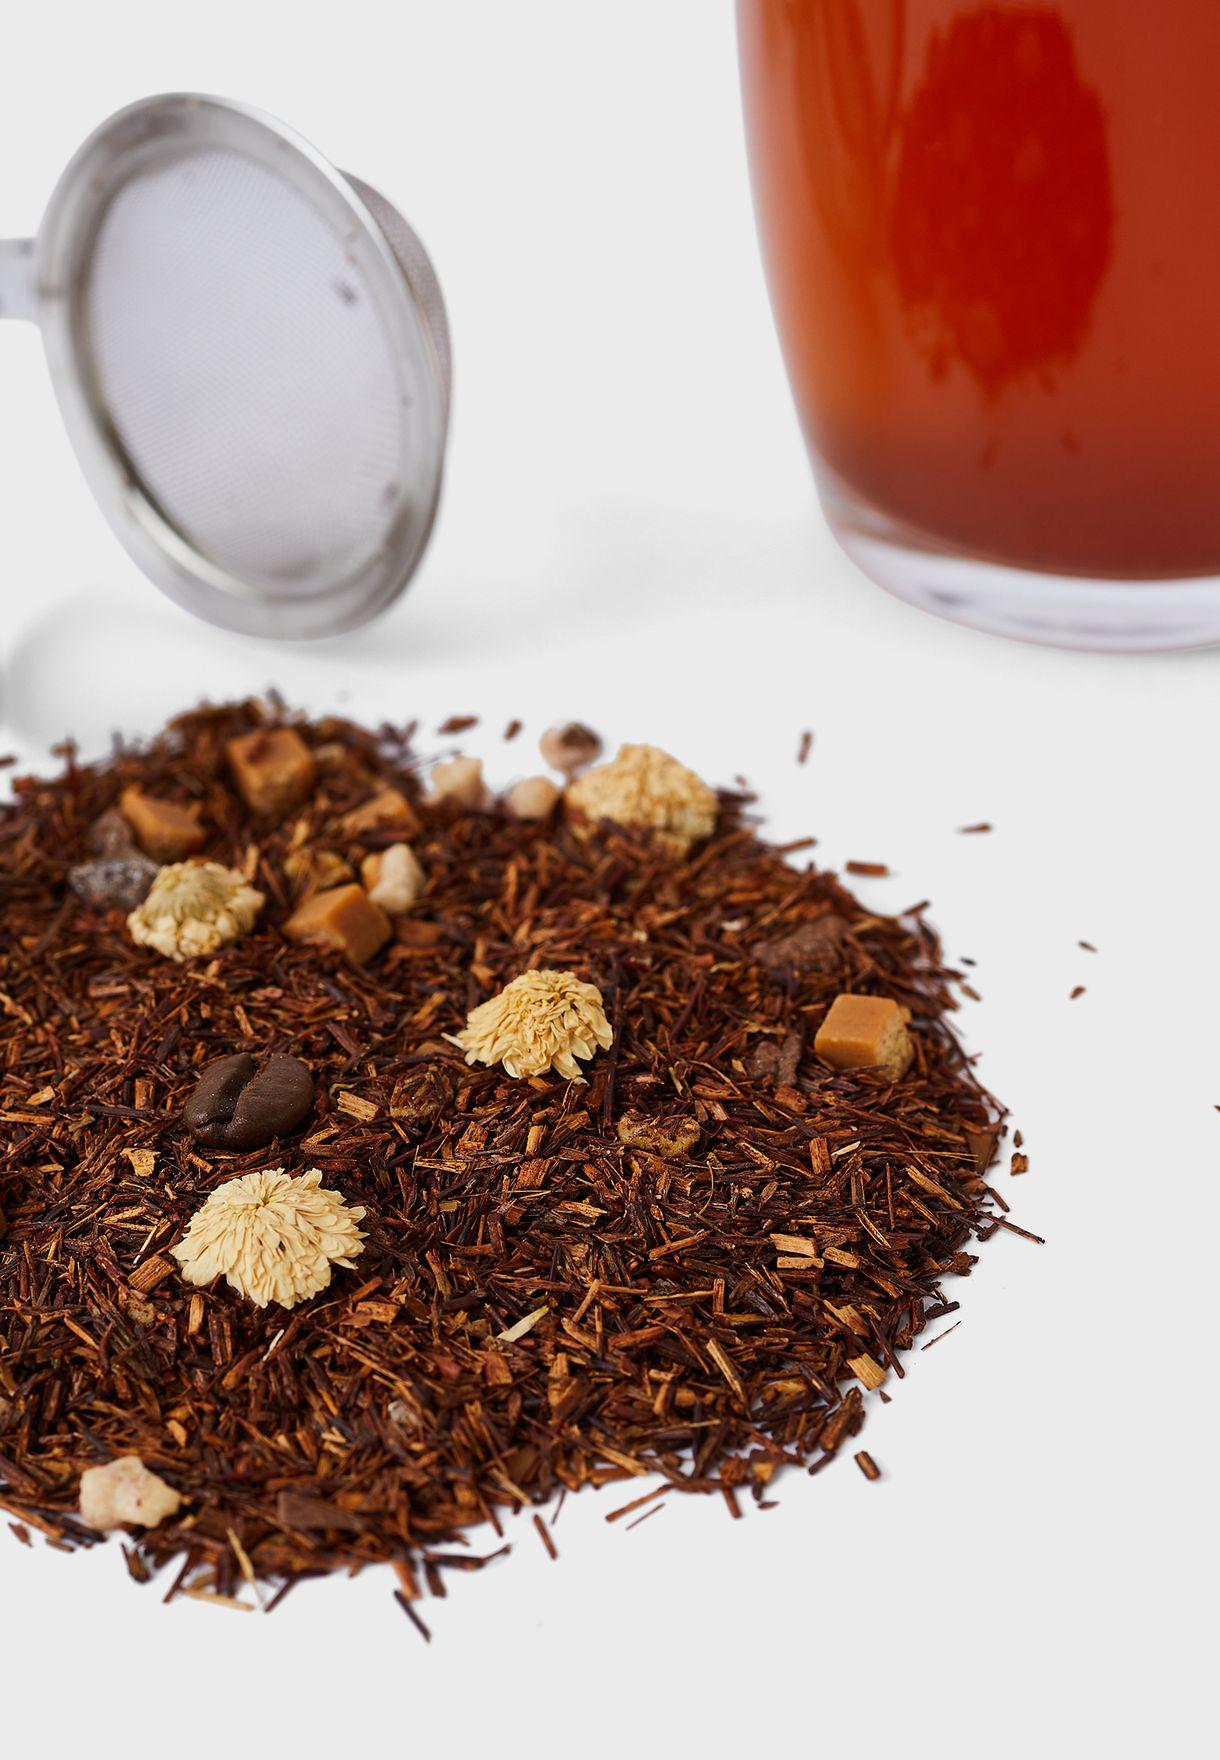 شاي اعشاب - تيراميسو